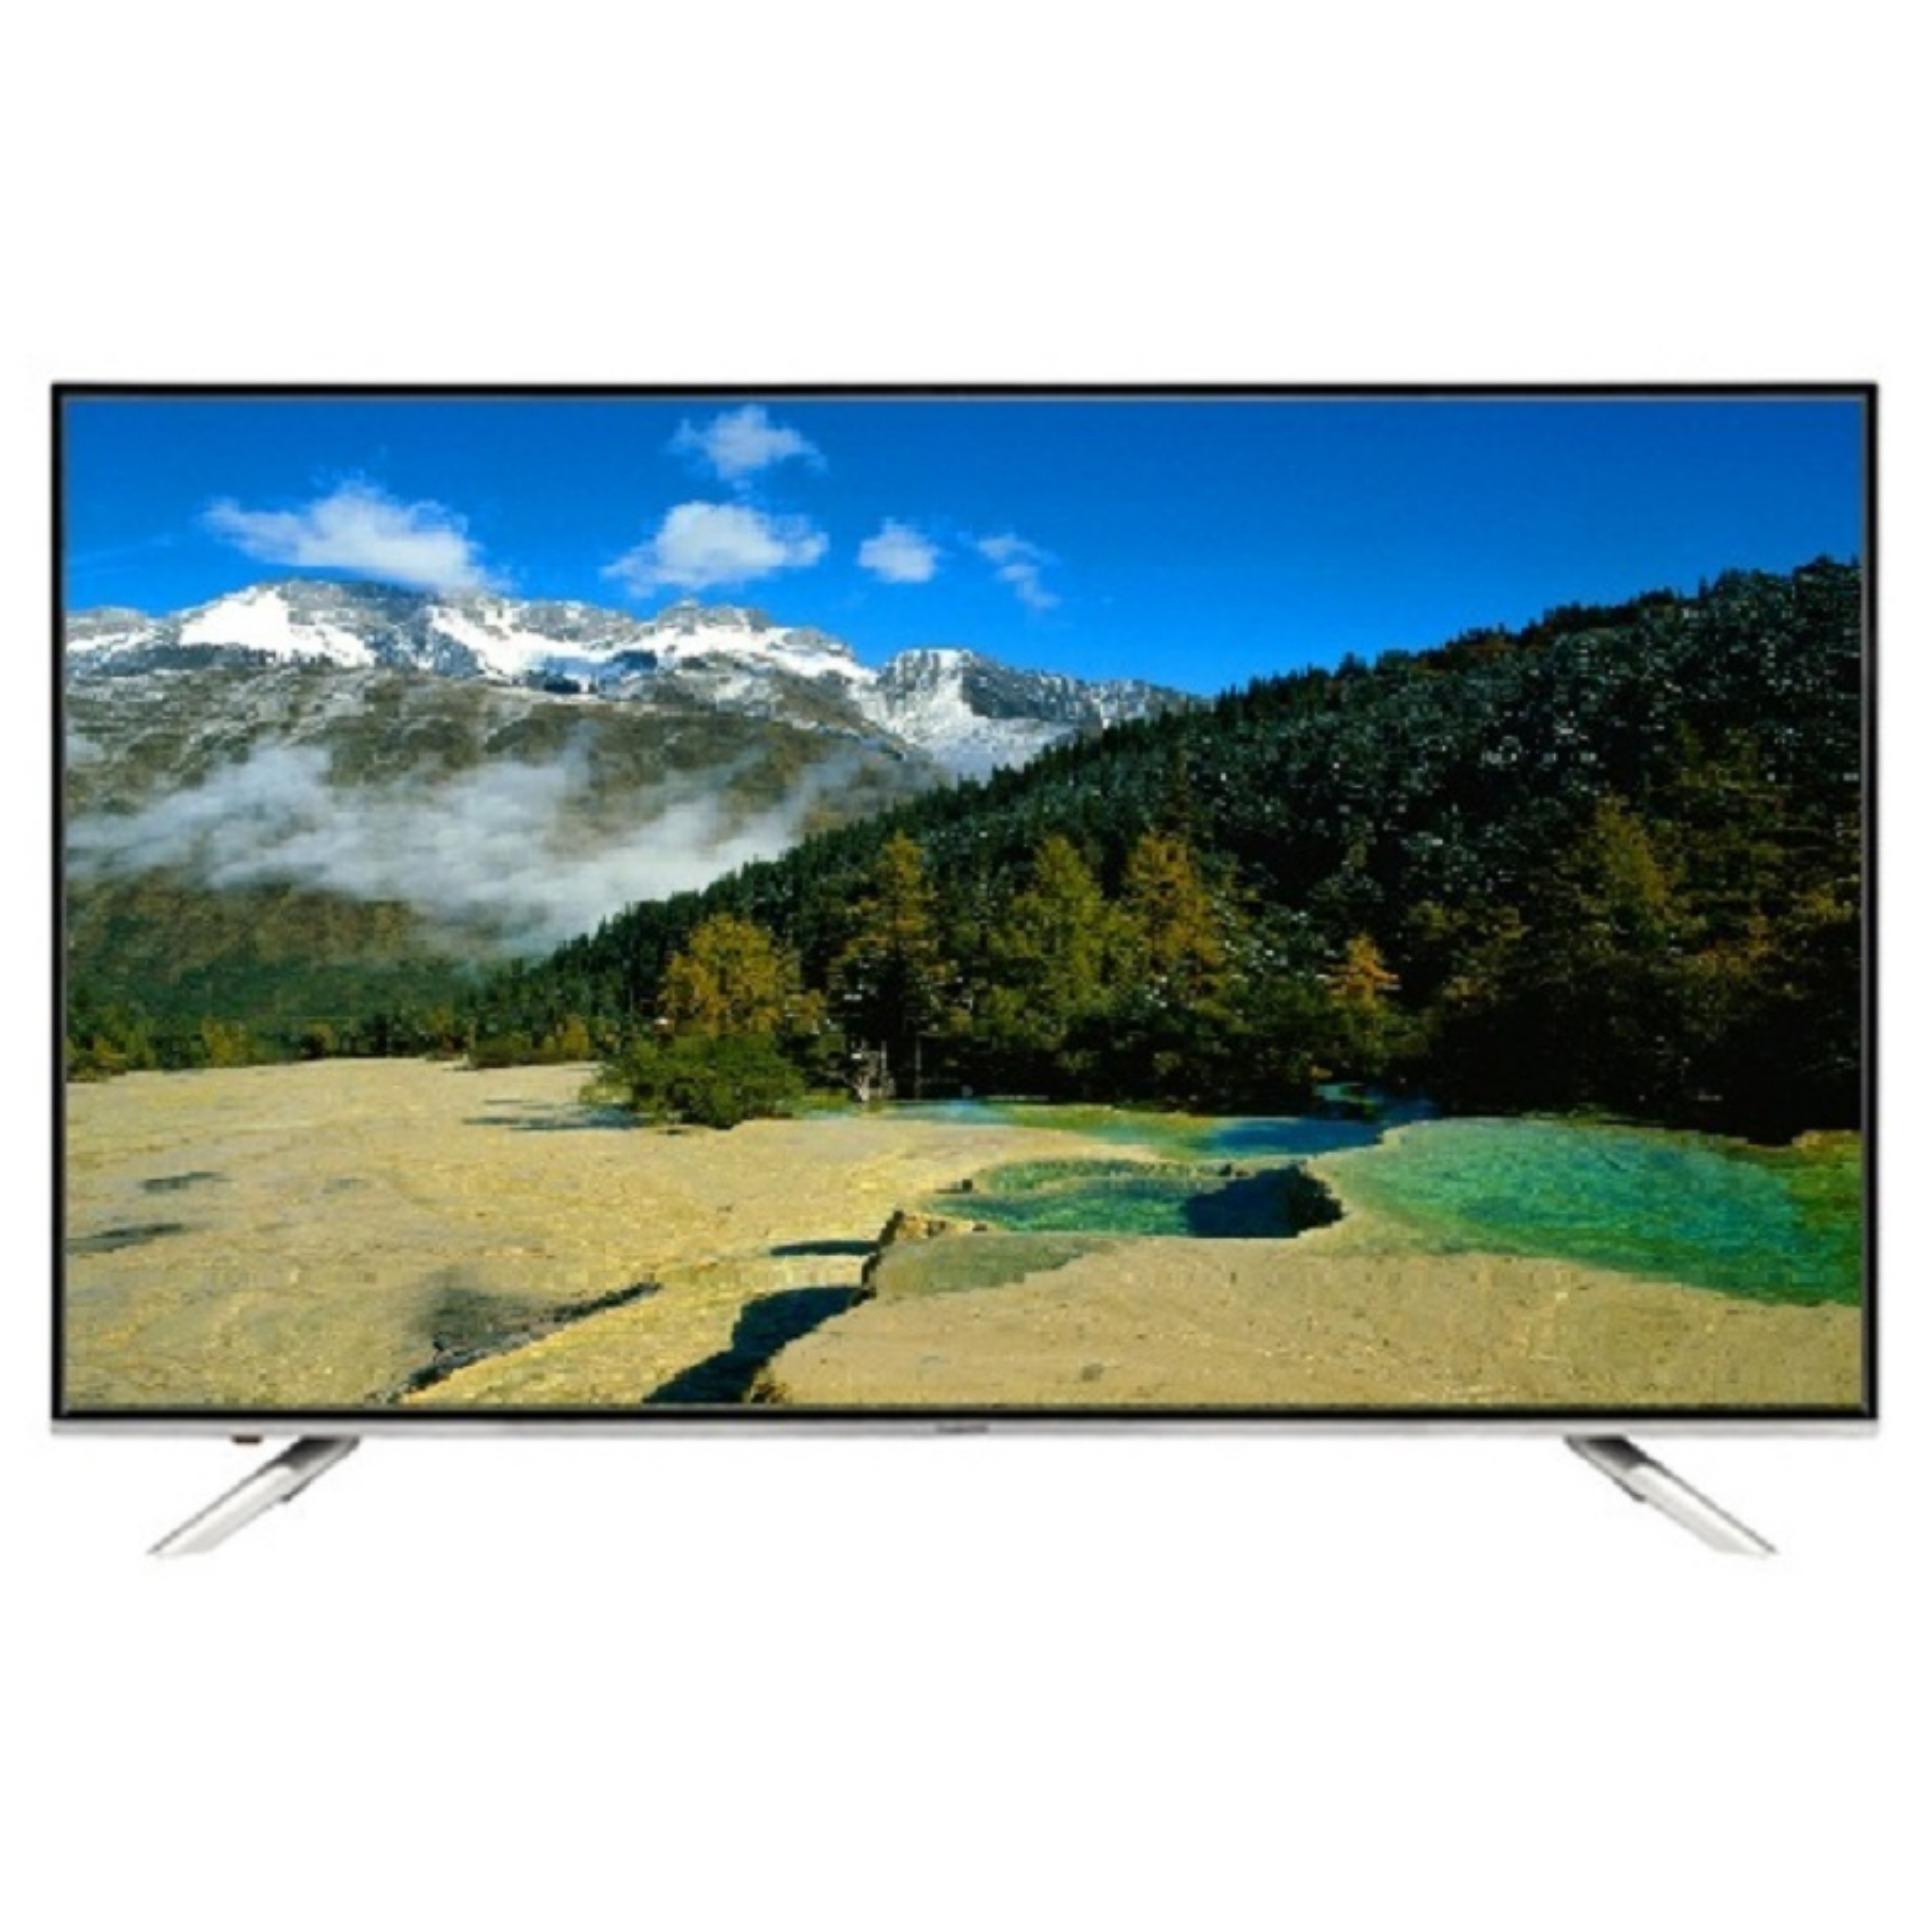 Changhong Smart Led TV 50D3000i - Free Bracket